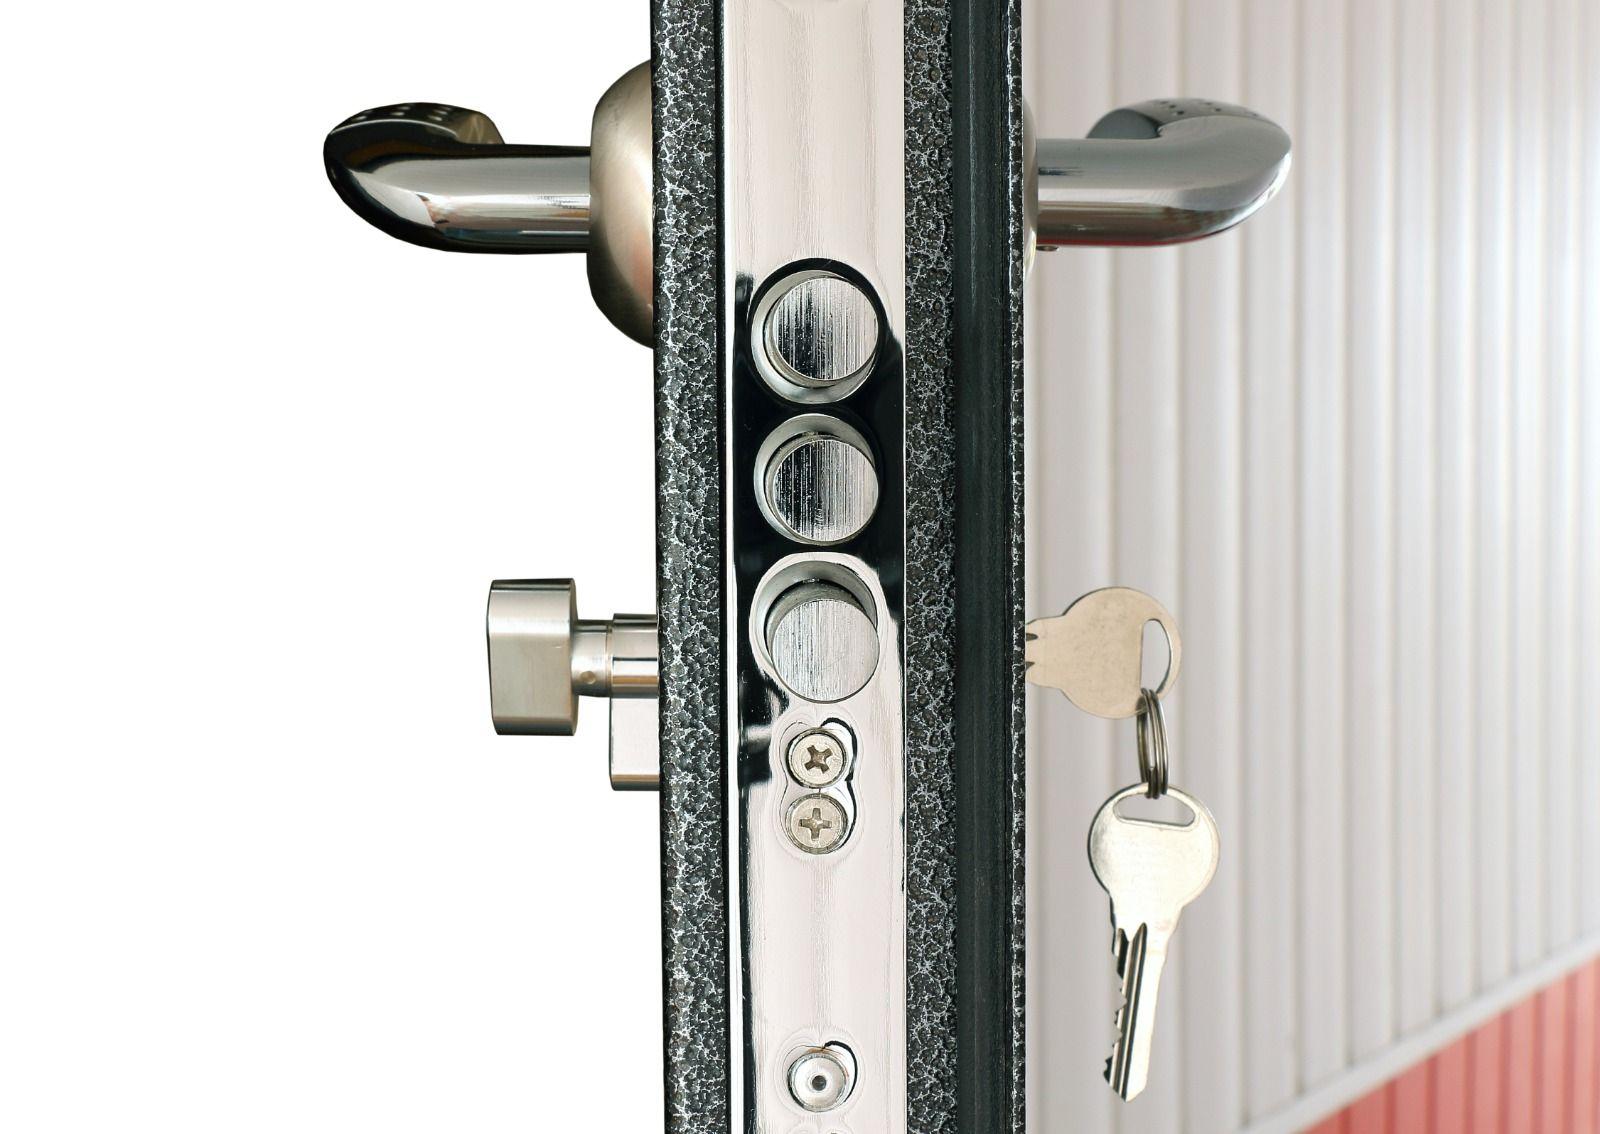 Sos Locksmith Dfw 940 613 8189 Www Soslocksmith Tx Com 2302b Myrtle Springs Ave Dallas In 2020 Locksmith Services Emergency Locksmith Locksmith